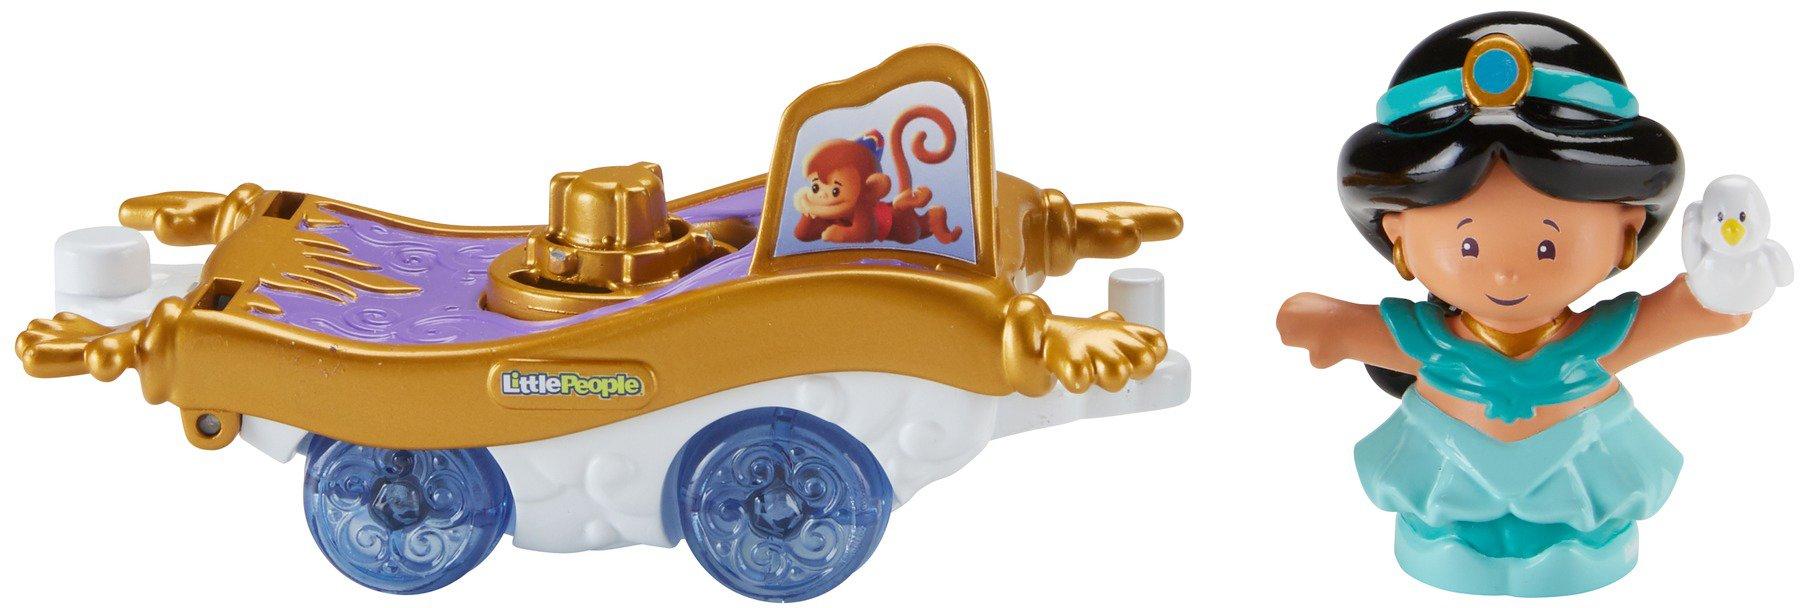 Fisher-Price Little People Disney Princess, Parade Jasmine & Abu's Float